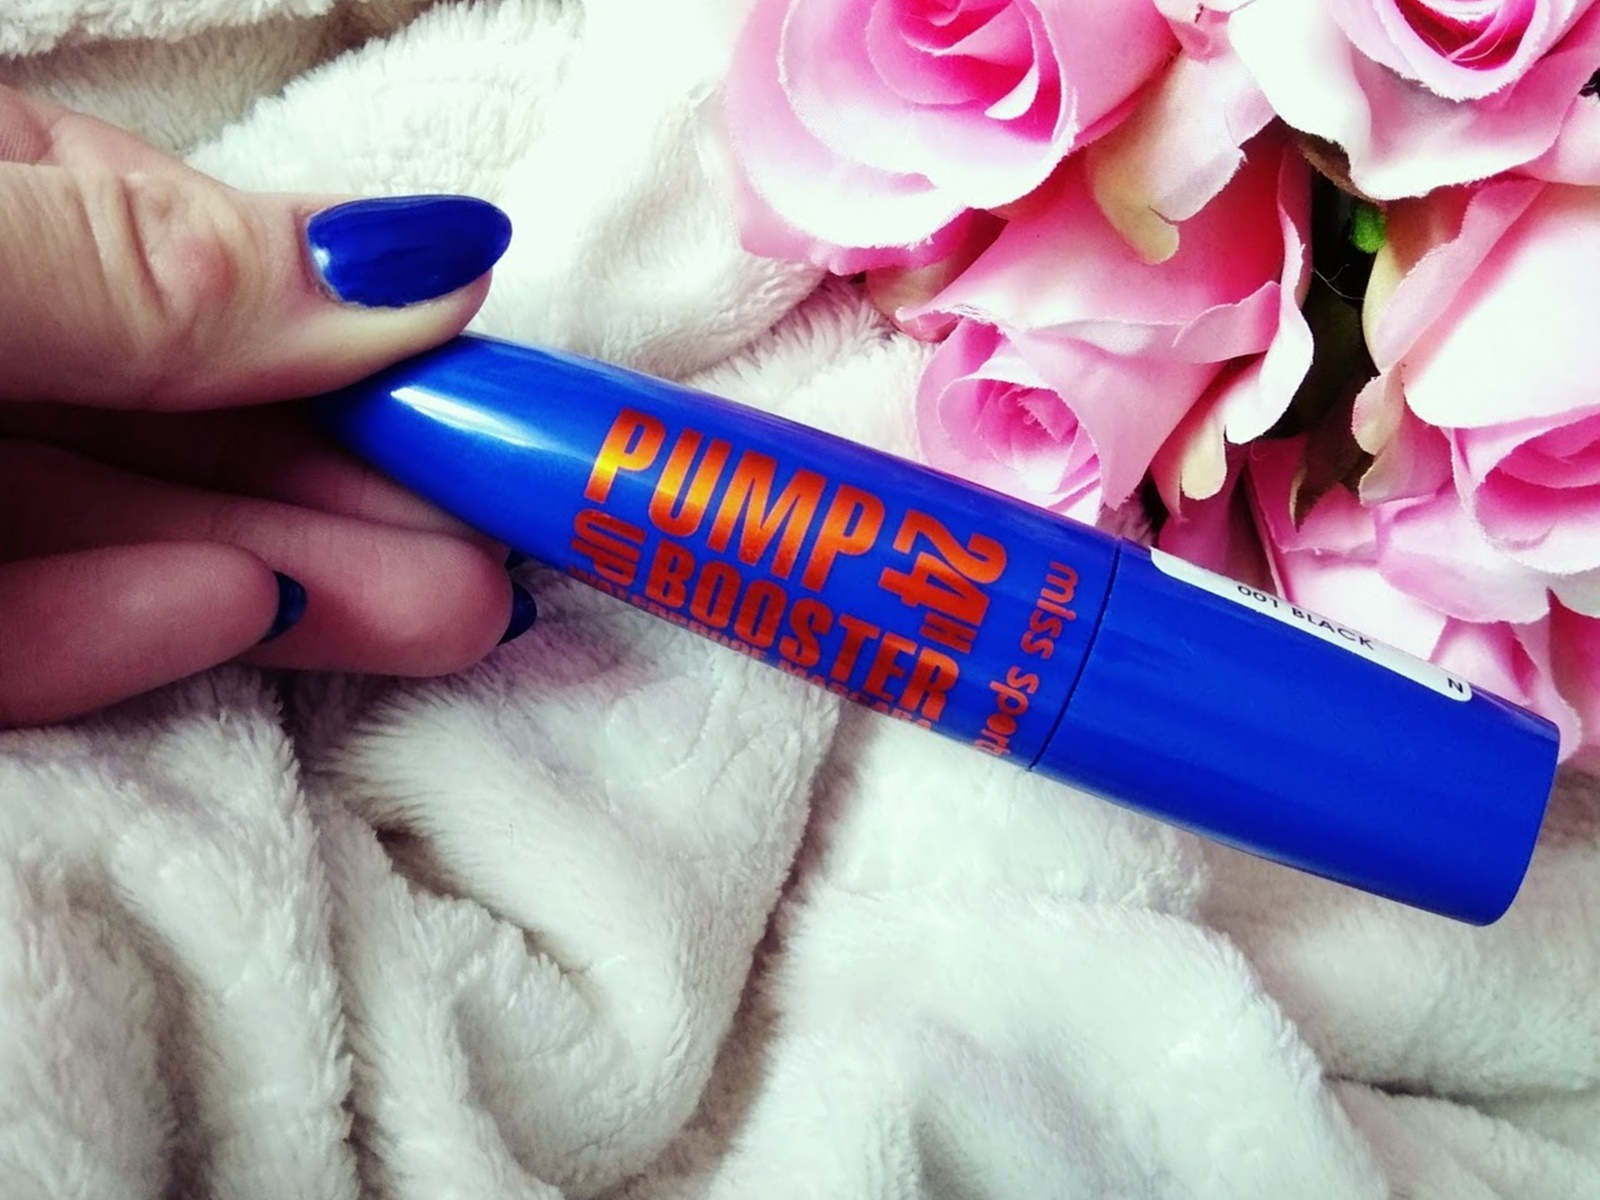 Maskara wodoodporny tusz do rzęs Miss Sporty Pump up booster